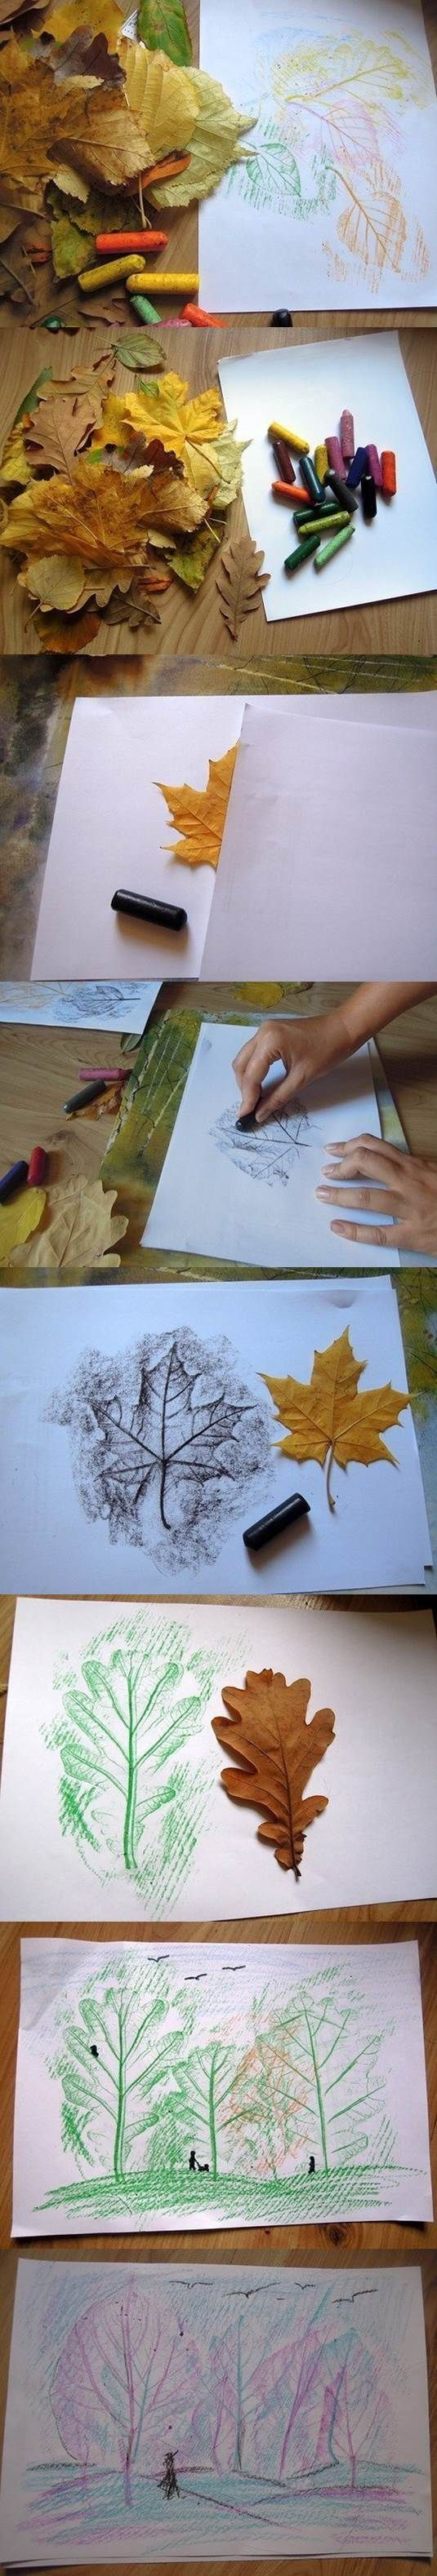 Creative Leaf Drawing | iCreativeIdeas.com Like Us on Facebook ==> https://www.facebook.com/icreativeideas